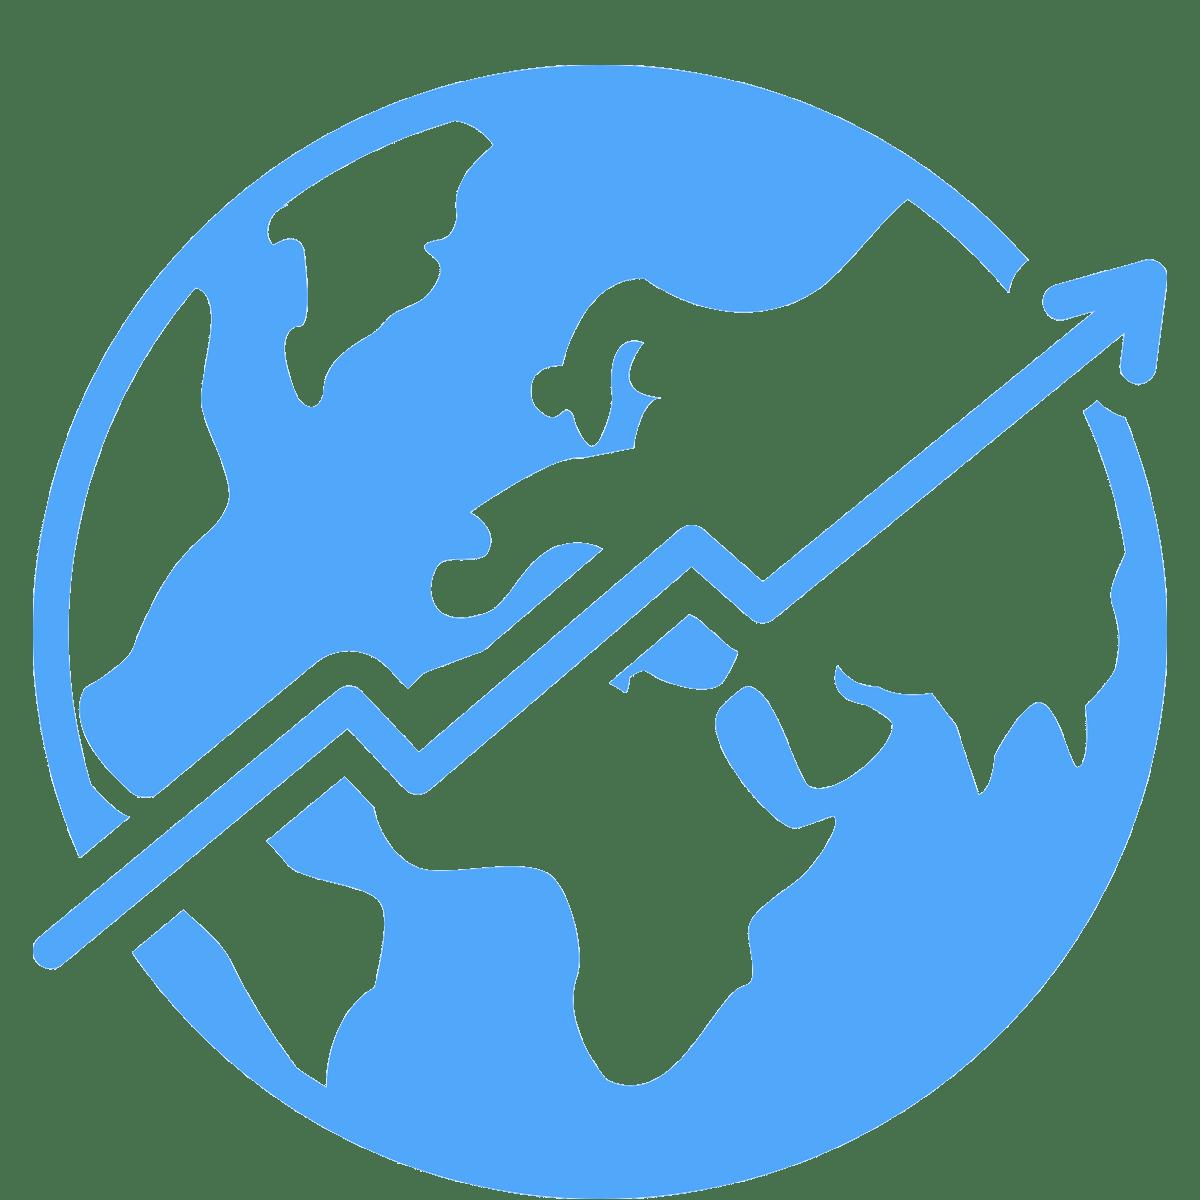 Explore Our Ocean Economy